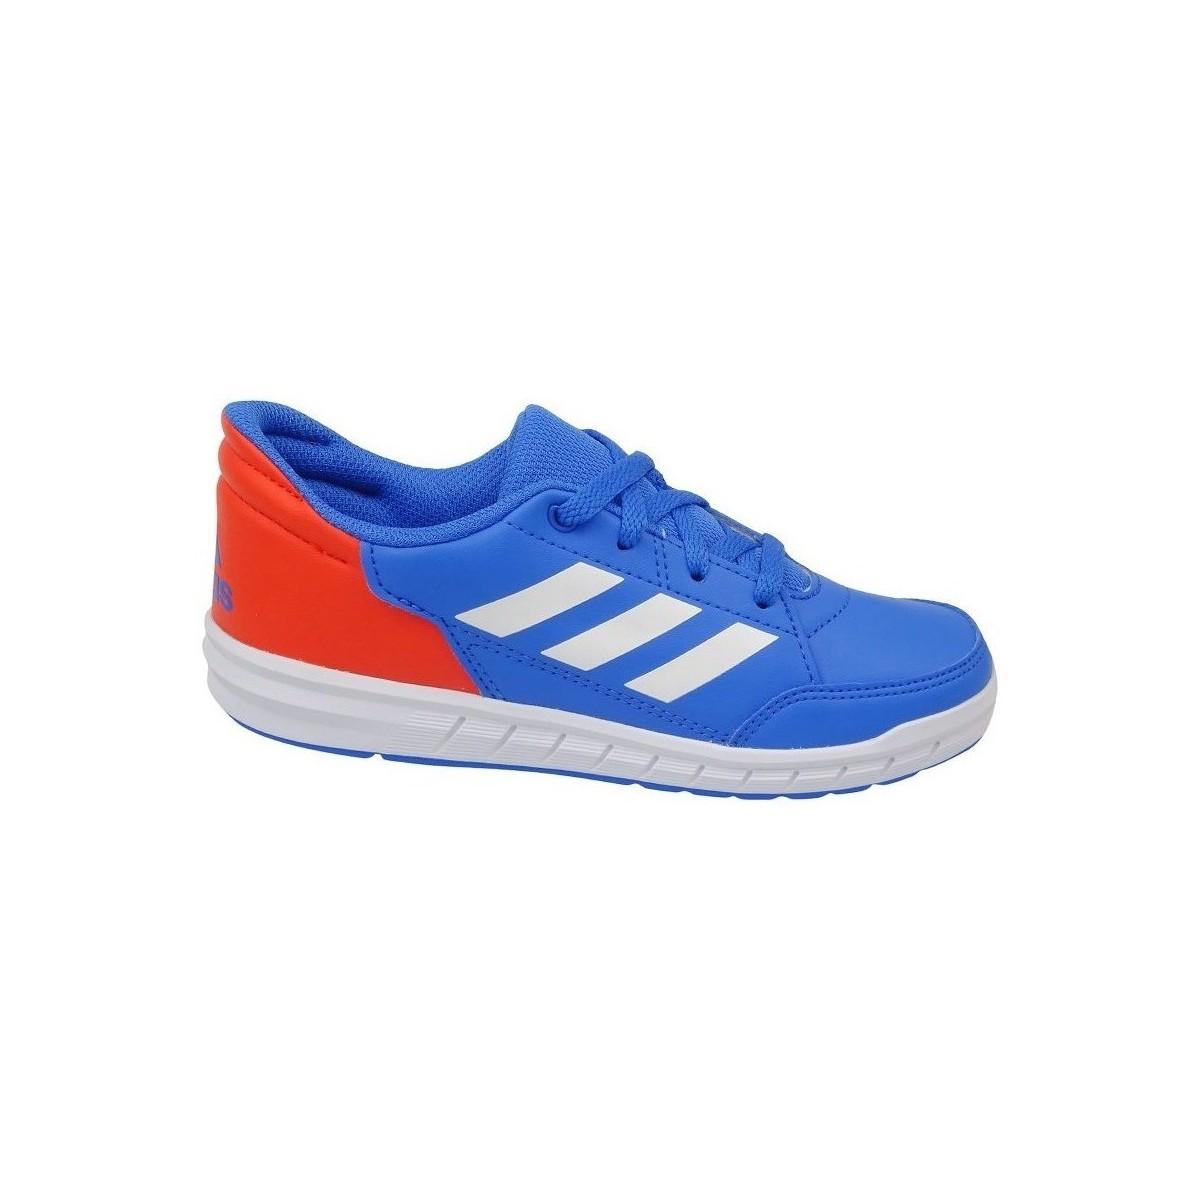 Sneakers adidas  Altasport K